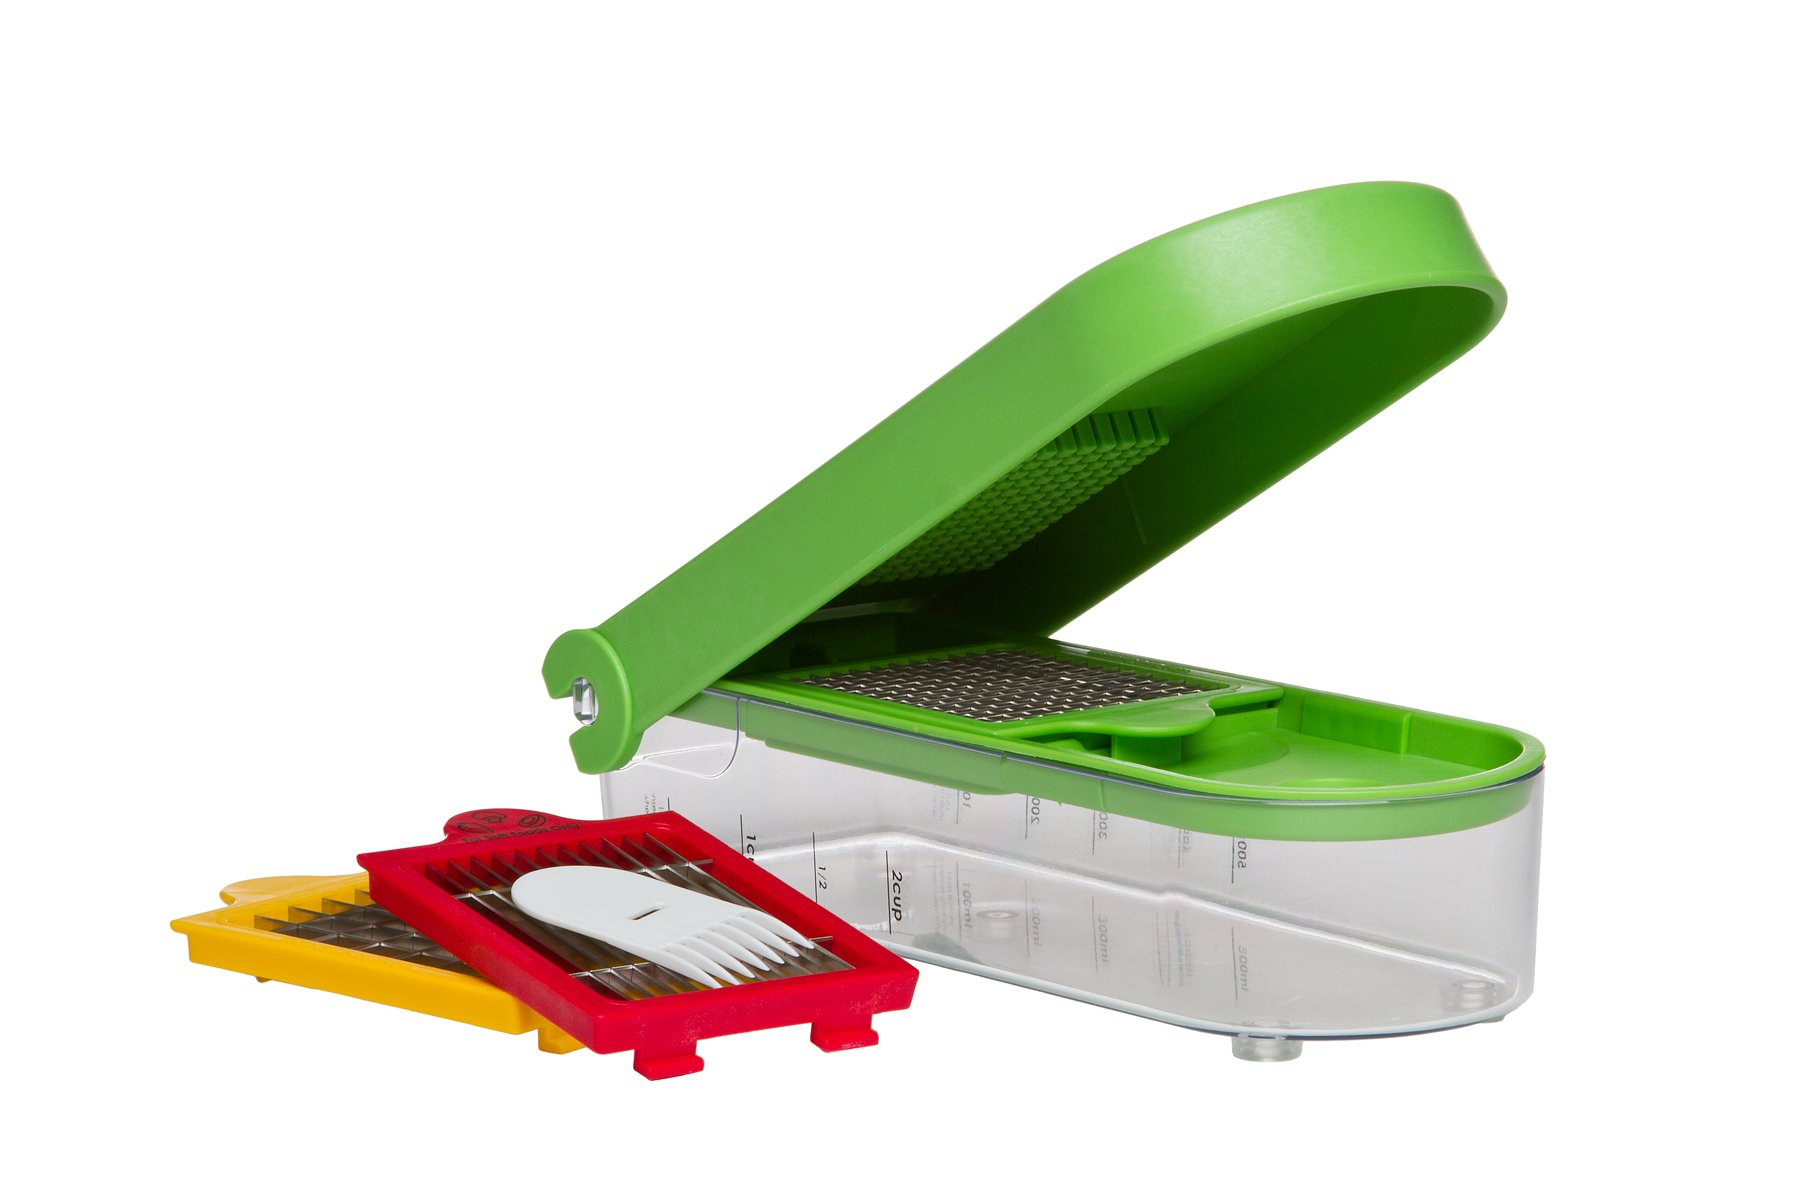 Prepworks by Progressive Dice and Slice Chopper, 3 Interchangeable Blades, Veggie Chopper, Fruit Chopper, Onion Chopper, Non-Skid Base